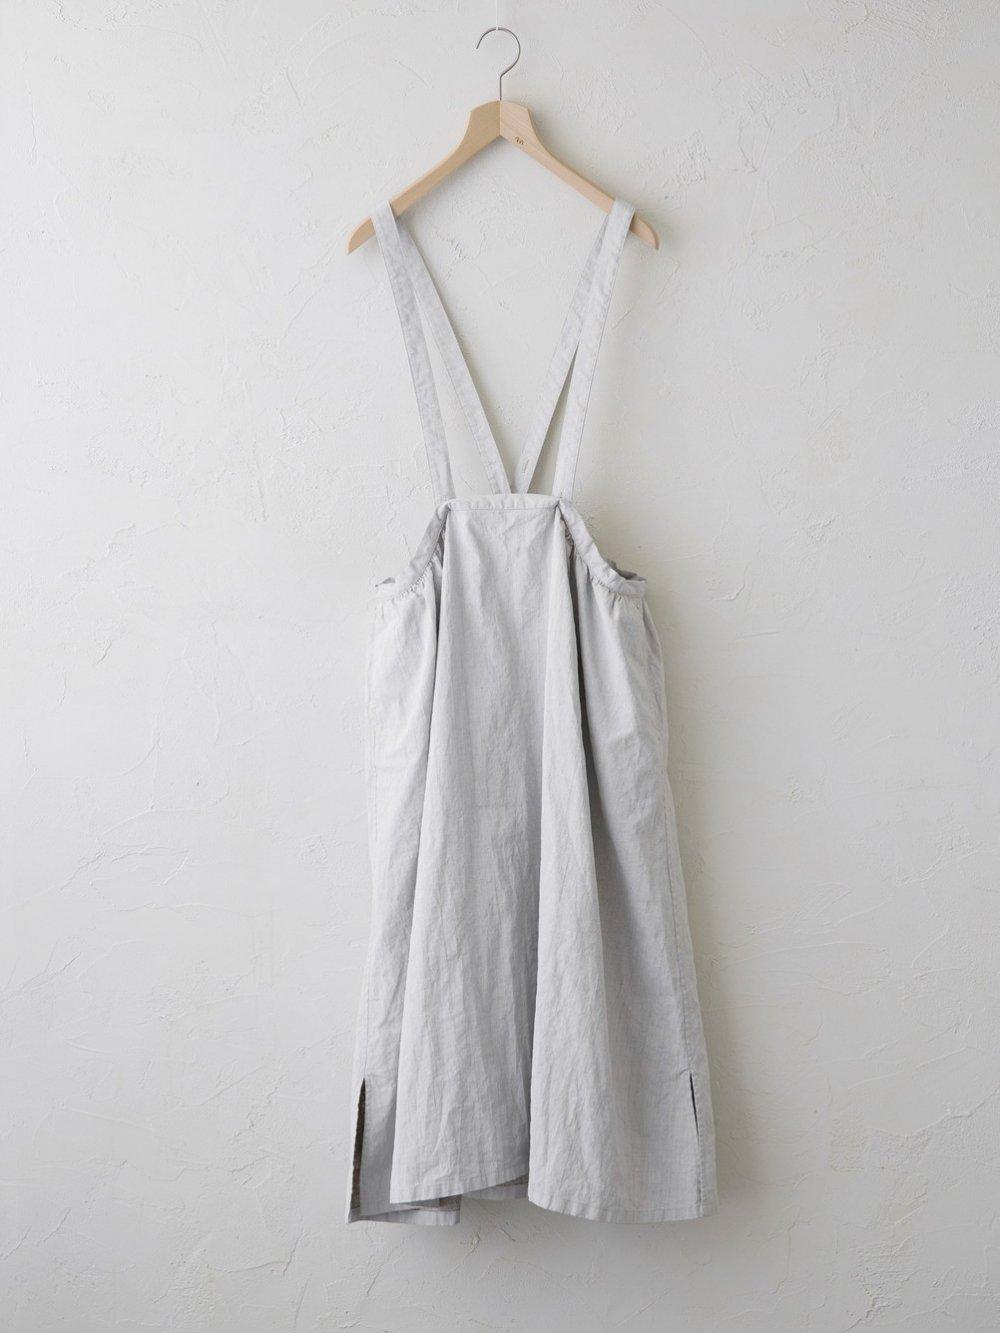 Belarus Linen(顔料プリント) ジャンパースカート